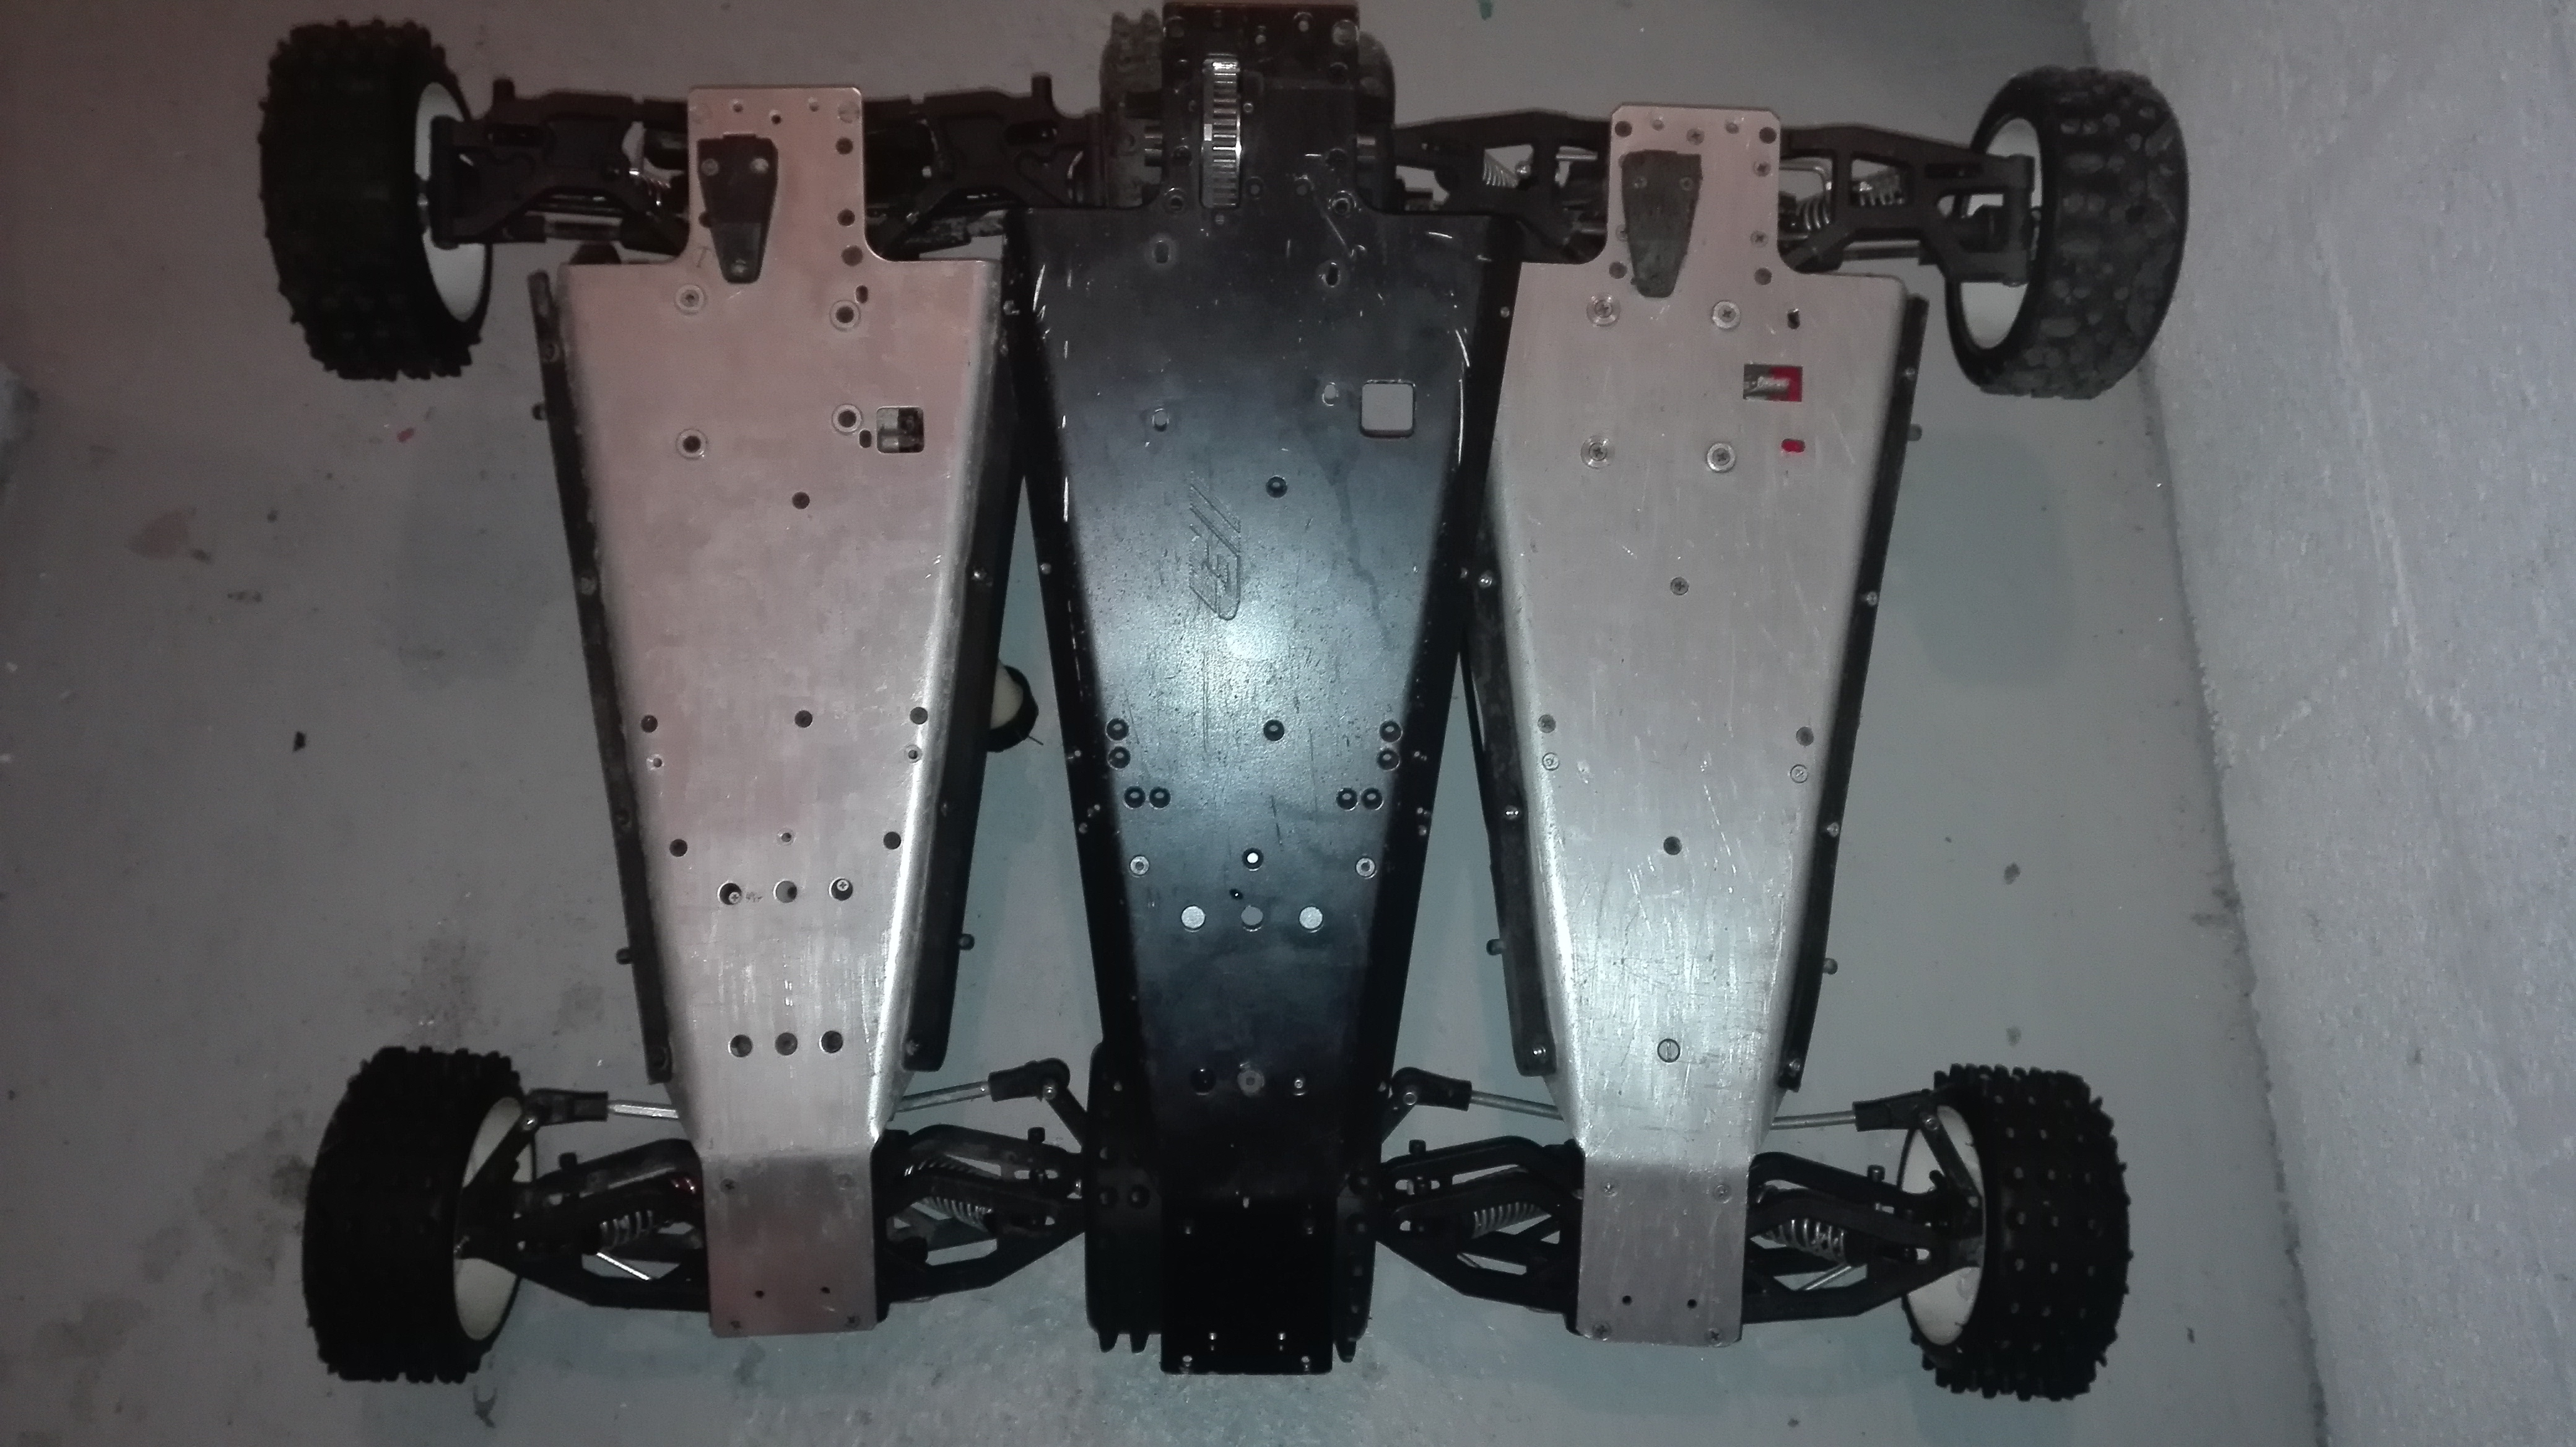 re-montage complet monster truck FG depuis un chassis nu - Page 2 180130105900621637